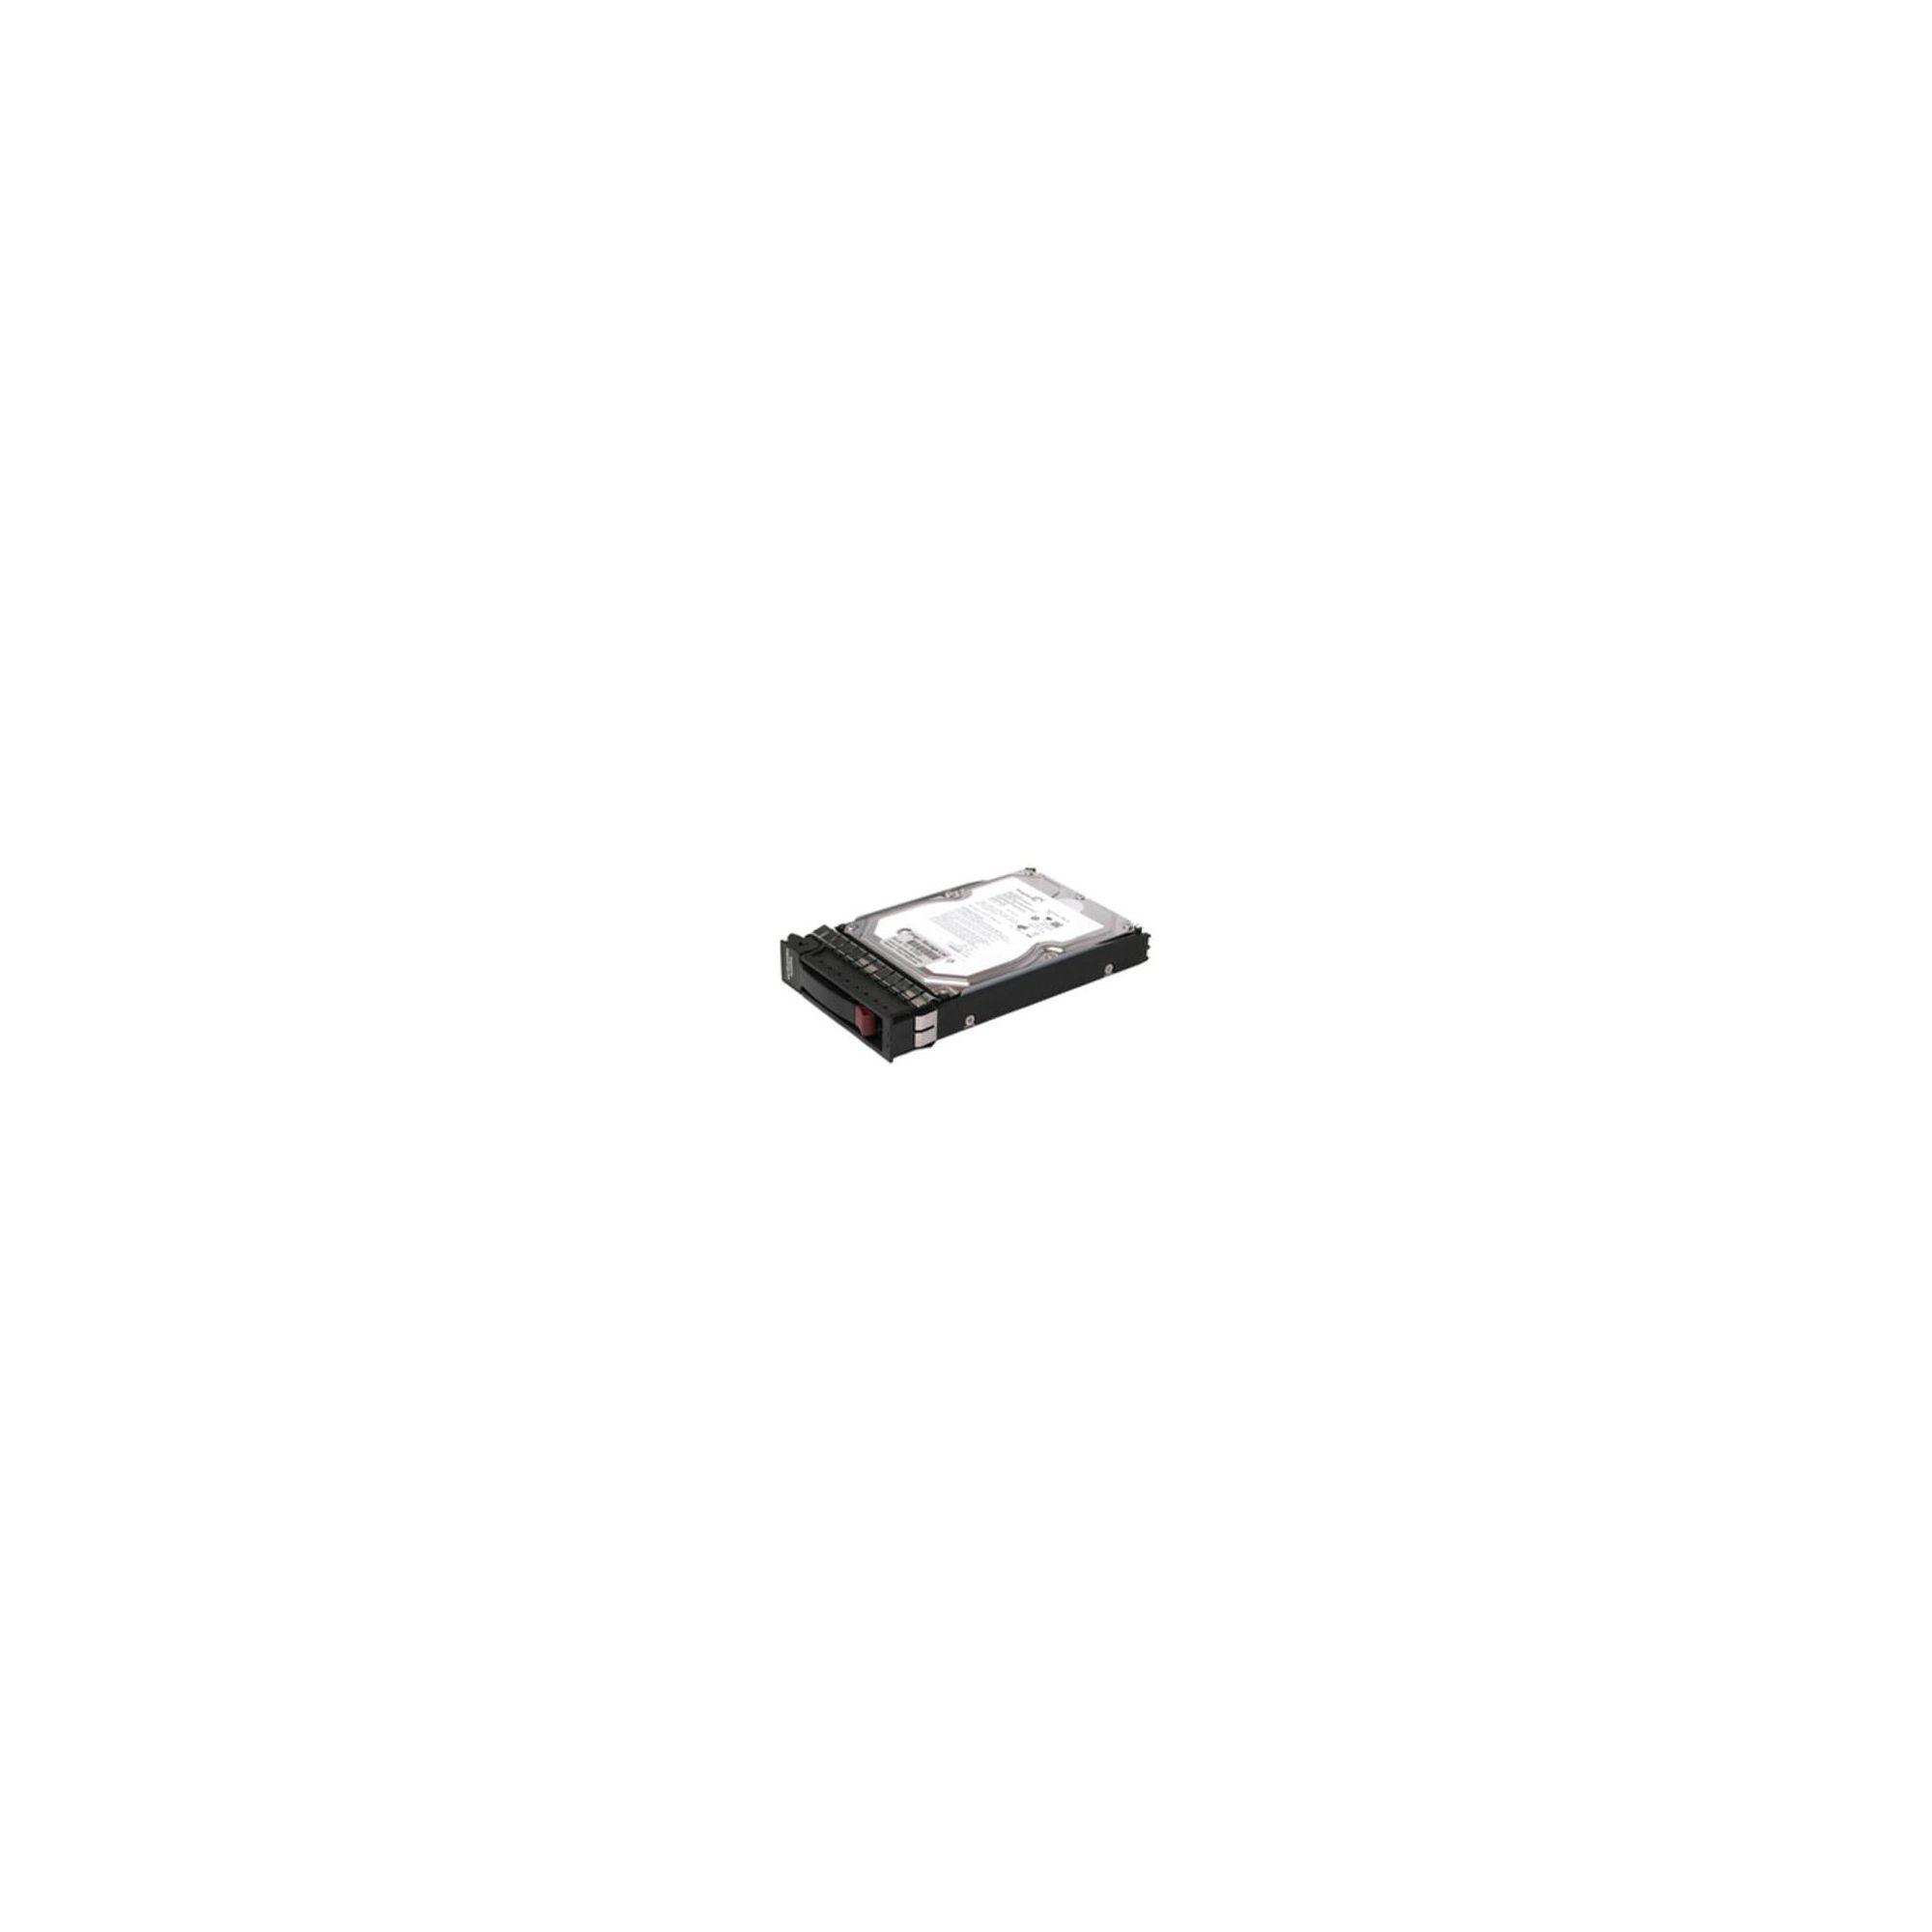 300GB 15K SAS Hot Swap Server Drive at Tescos Direct